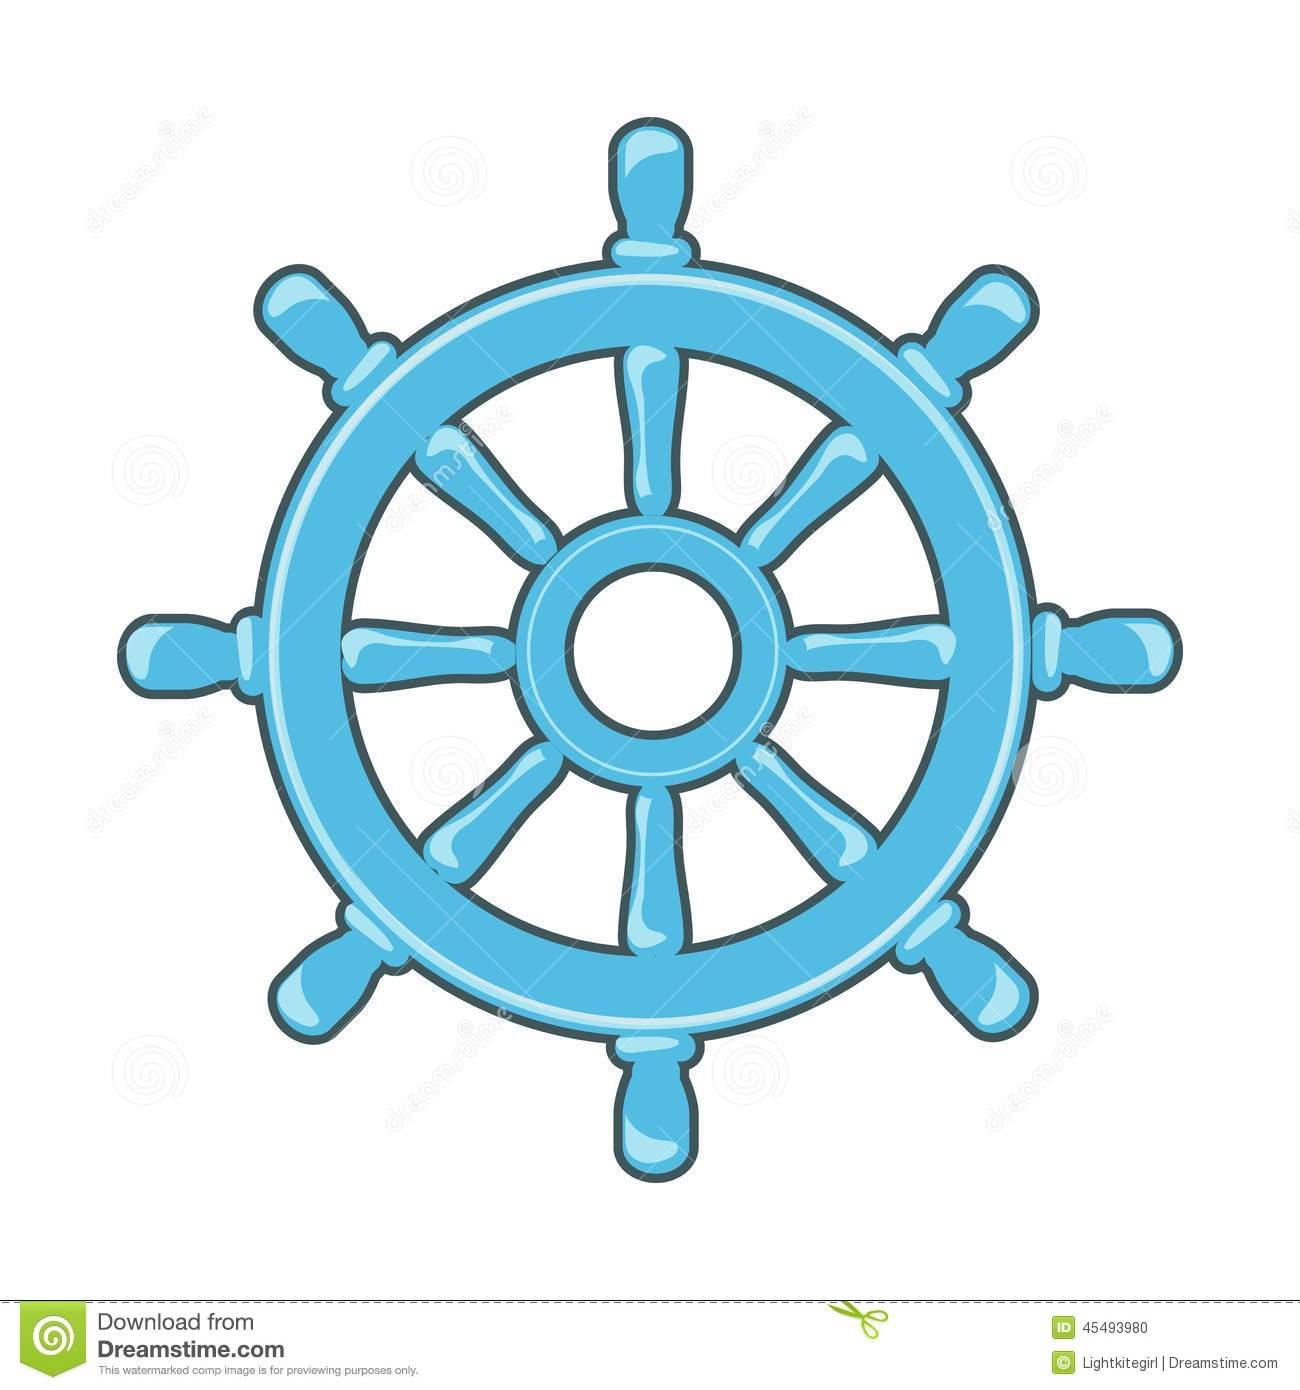 Nautical Wheel Clipart - Clipart Suggest